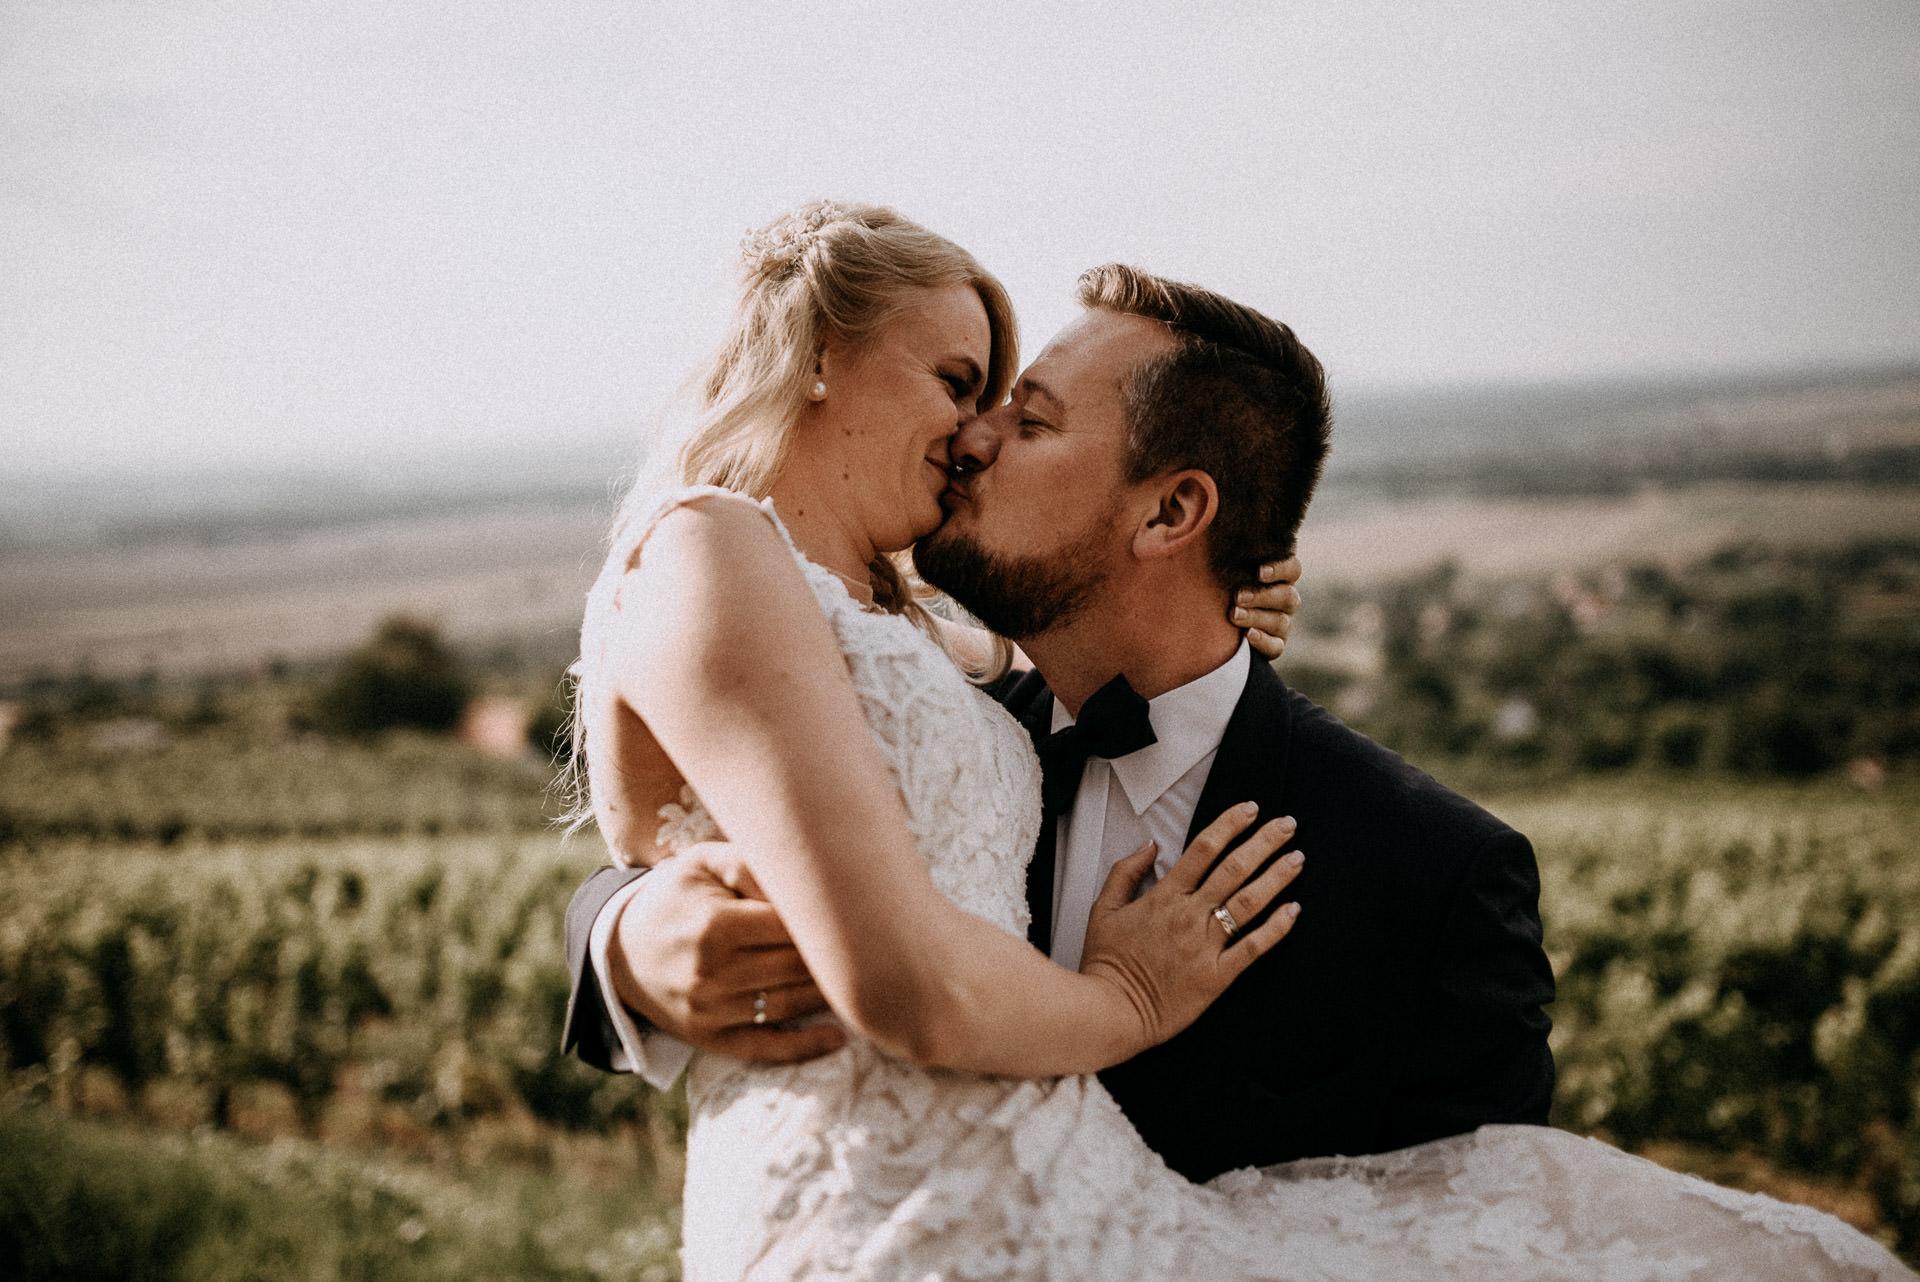 kiss bride groom smile